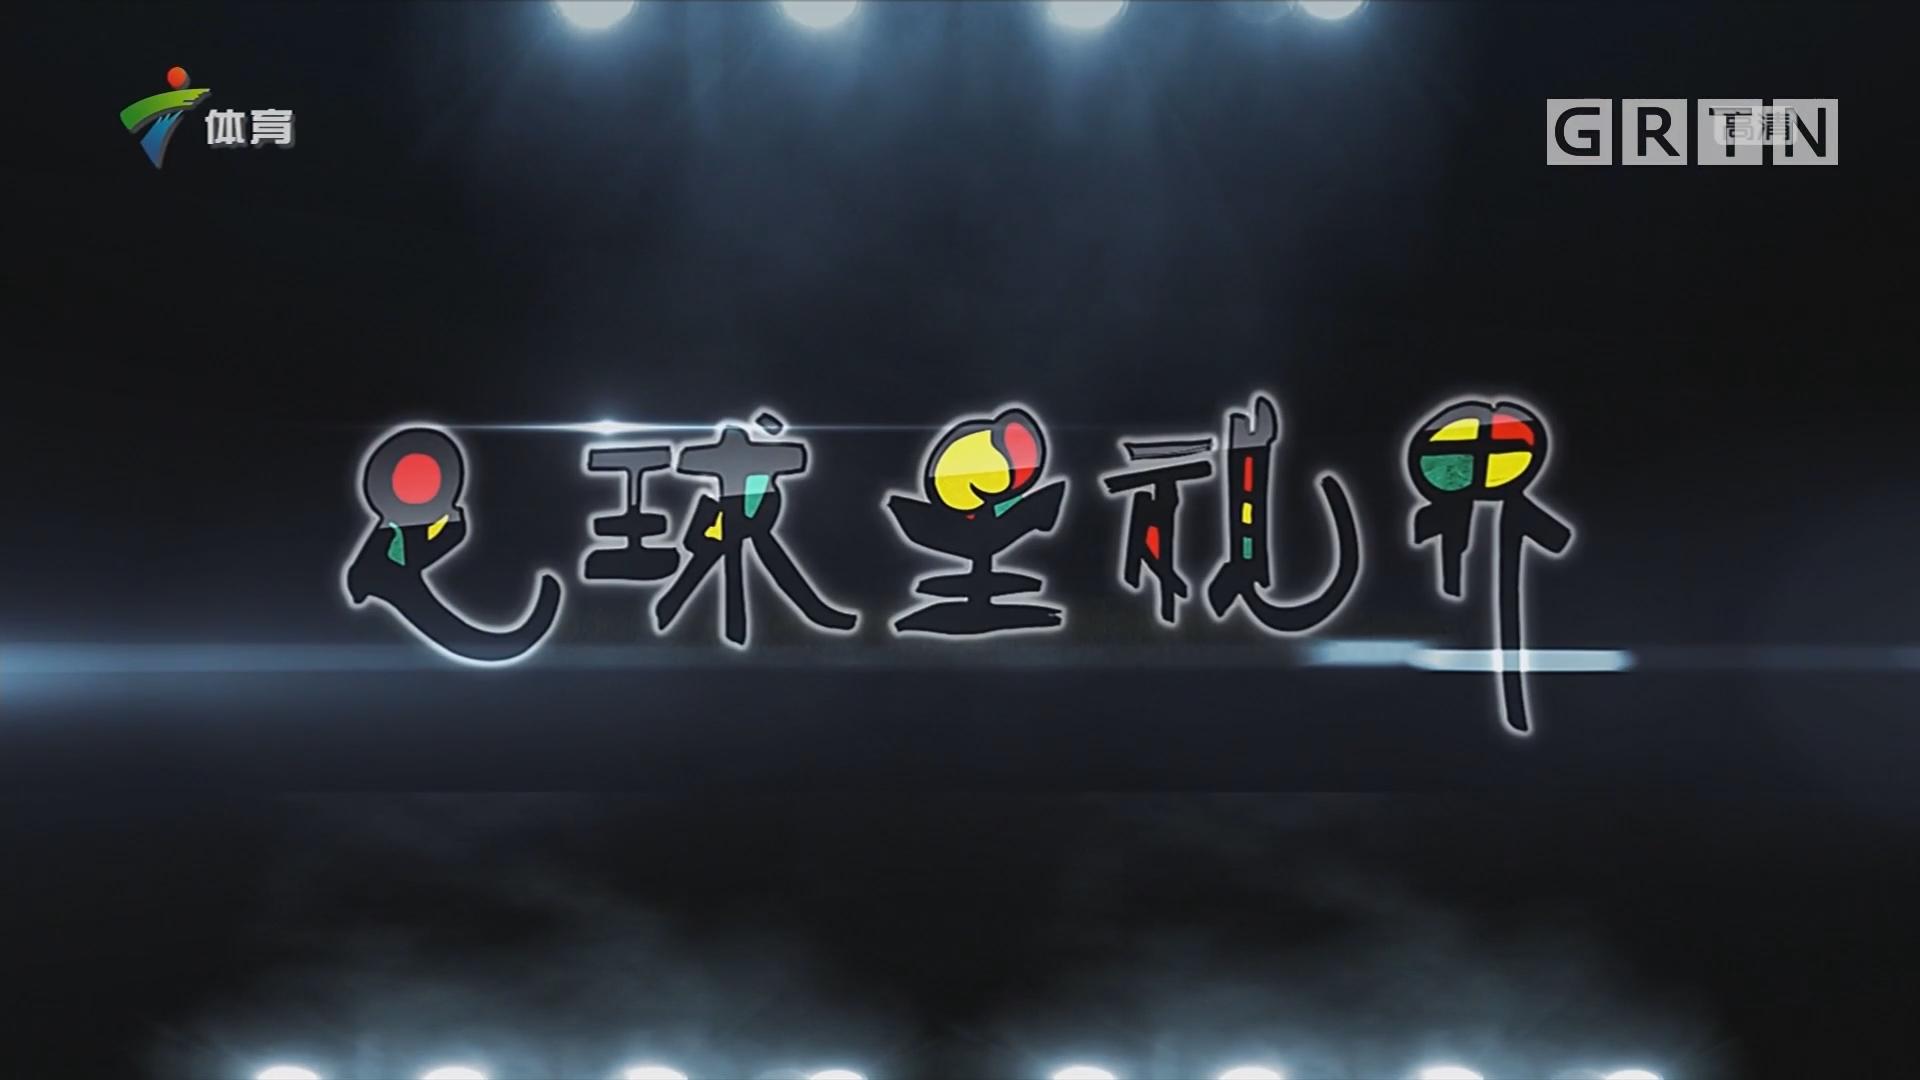 [HD][2018-02-12]足球星视界:广州恒大:新赛季 新挑战 新目标